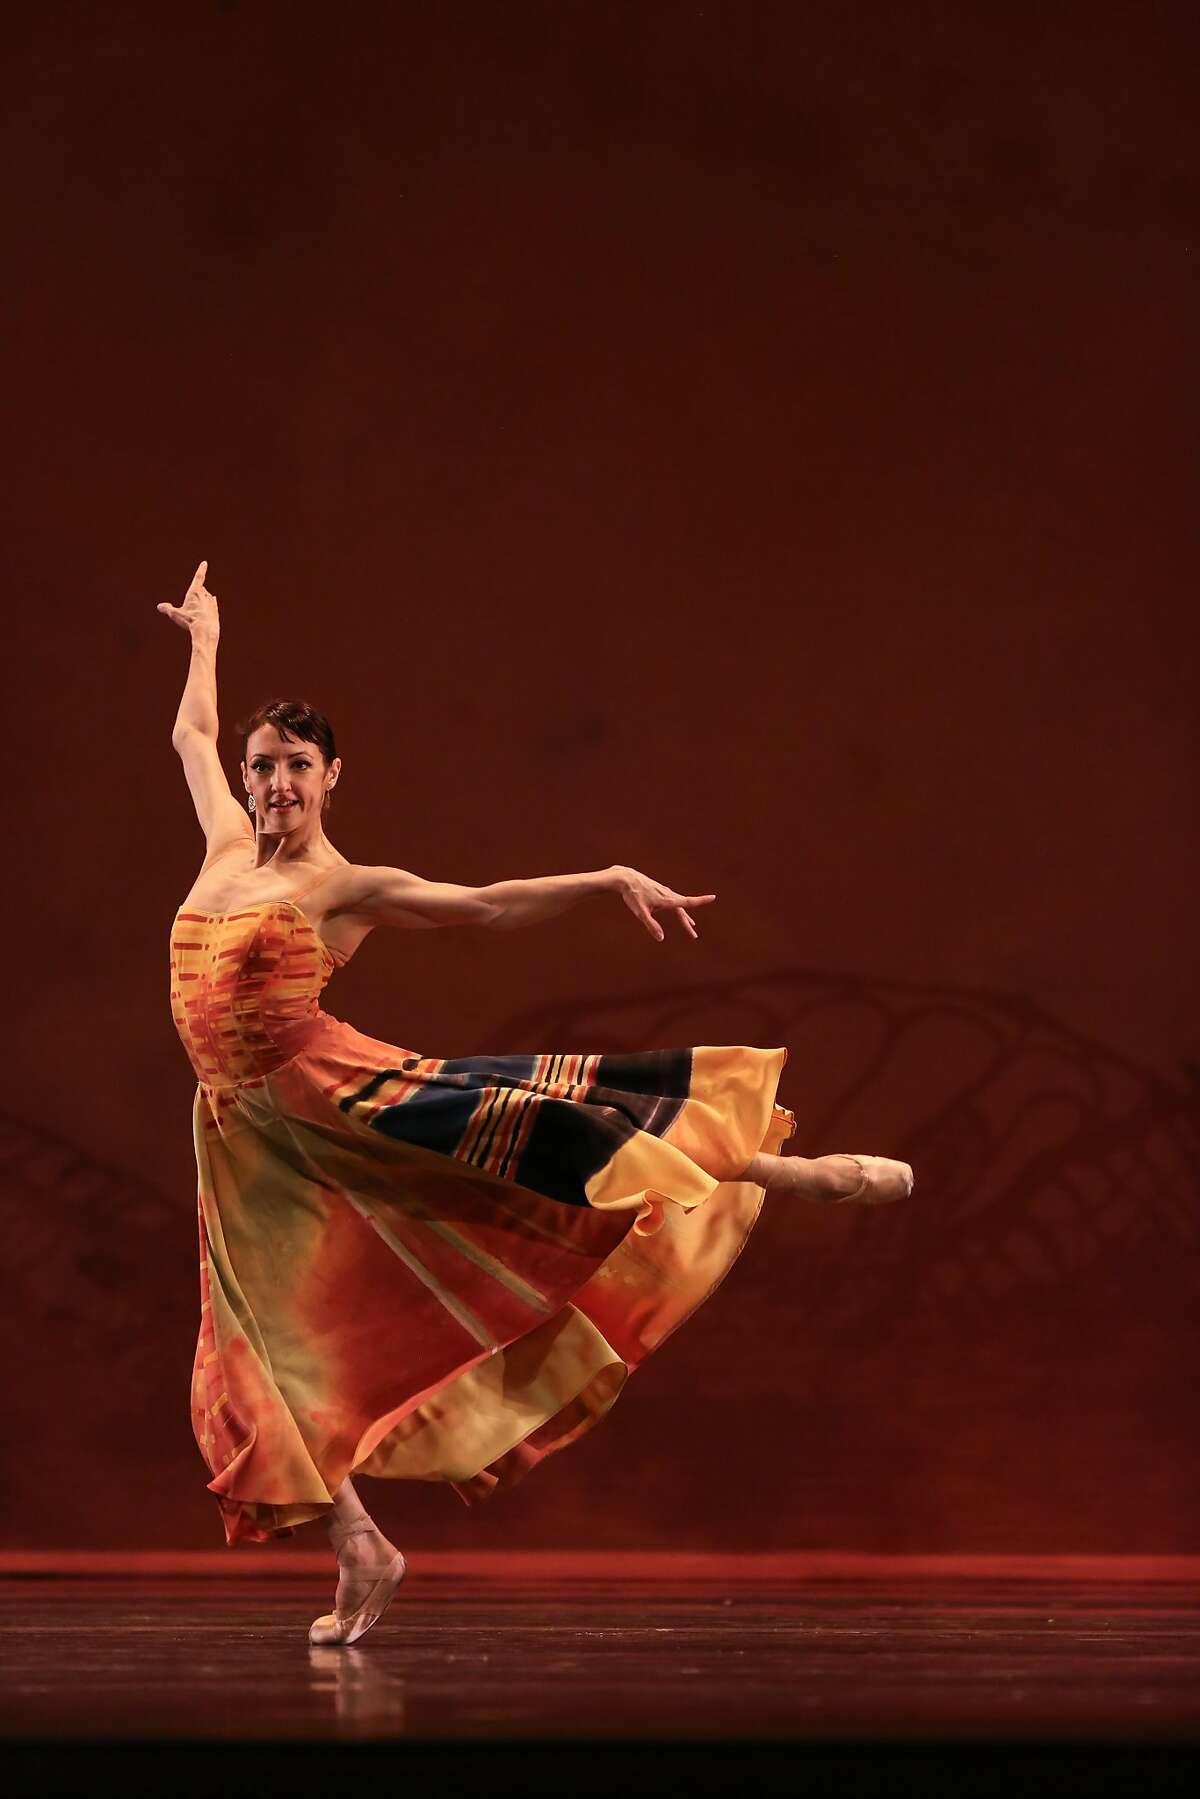 Lorena Feijoo, of the San Francisco Ballet, performs a dress rehearsal of Caniparoli's Lambarena at the War Memorial Opera House in San Francisco on Tuesday, January 27, 2015.